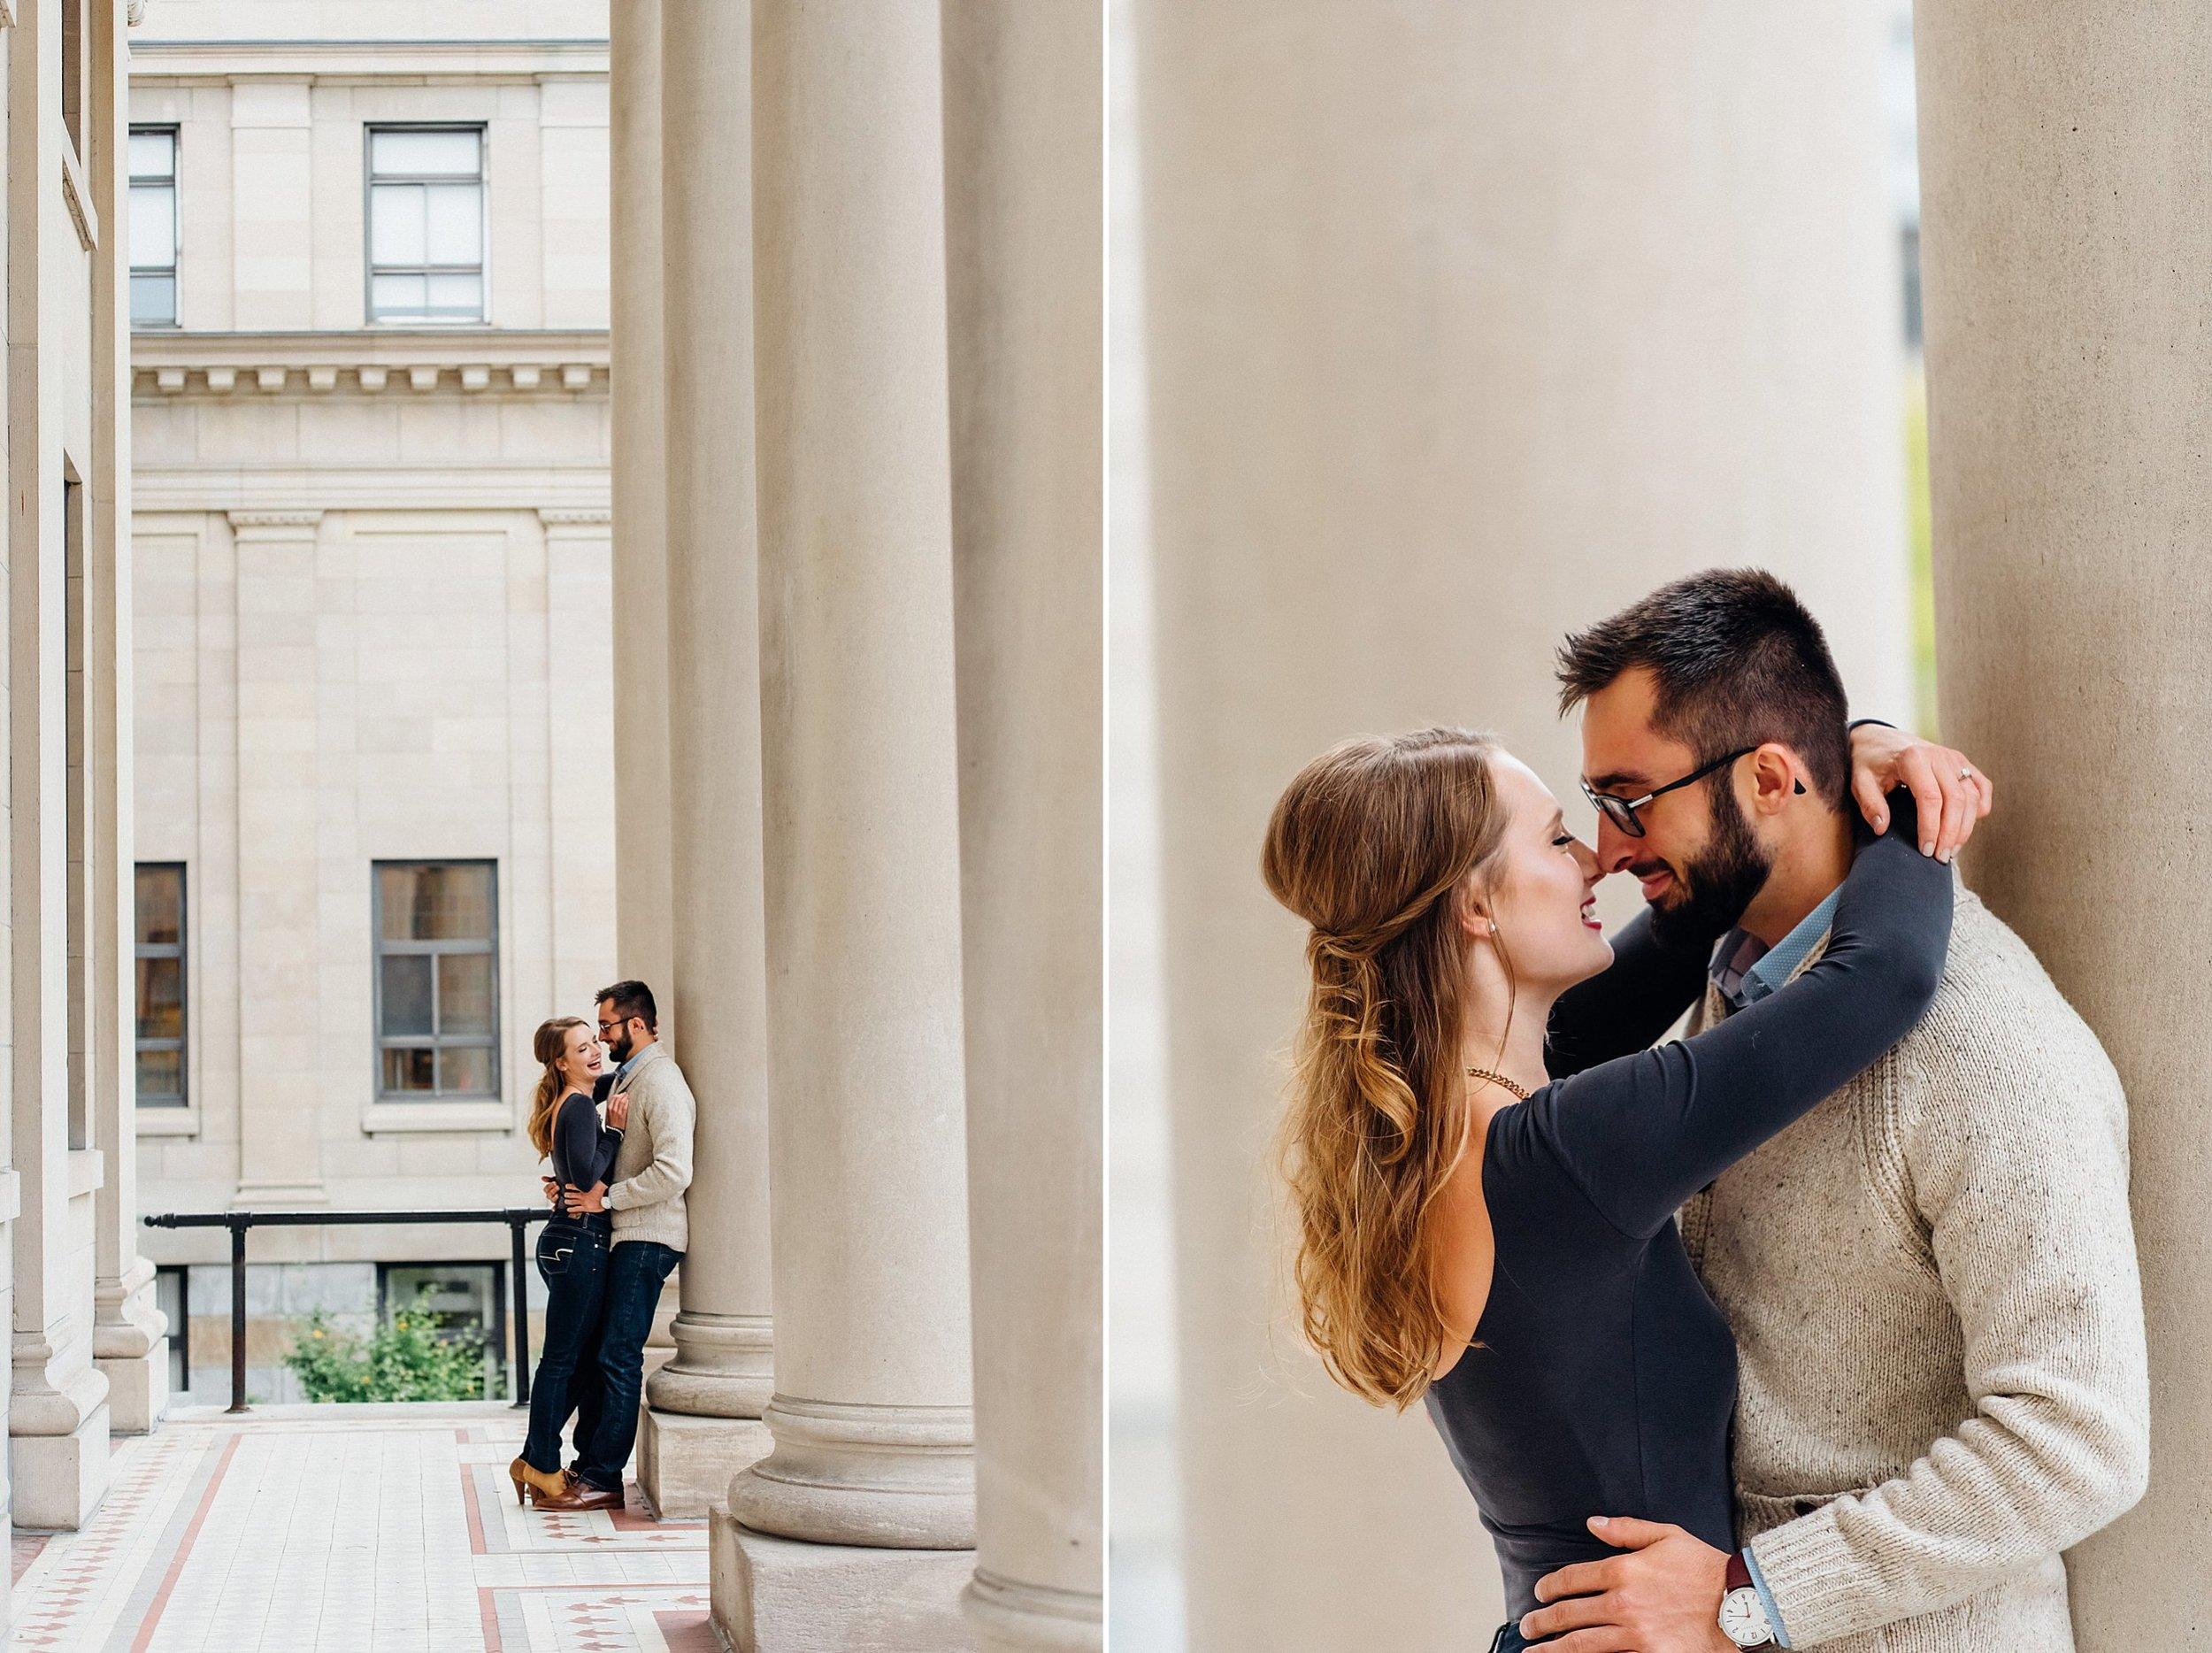 Ali and Batoul Photography - light, airy, indie documentary Ottawa wedding photographer_0150.jpg